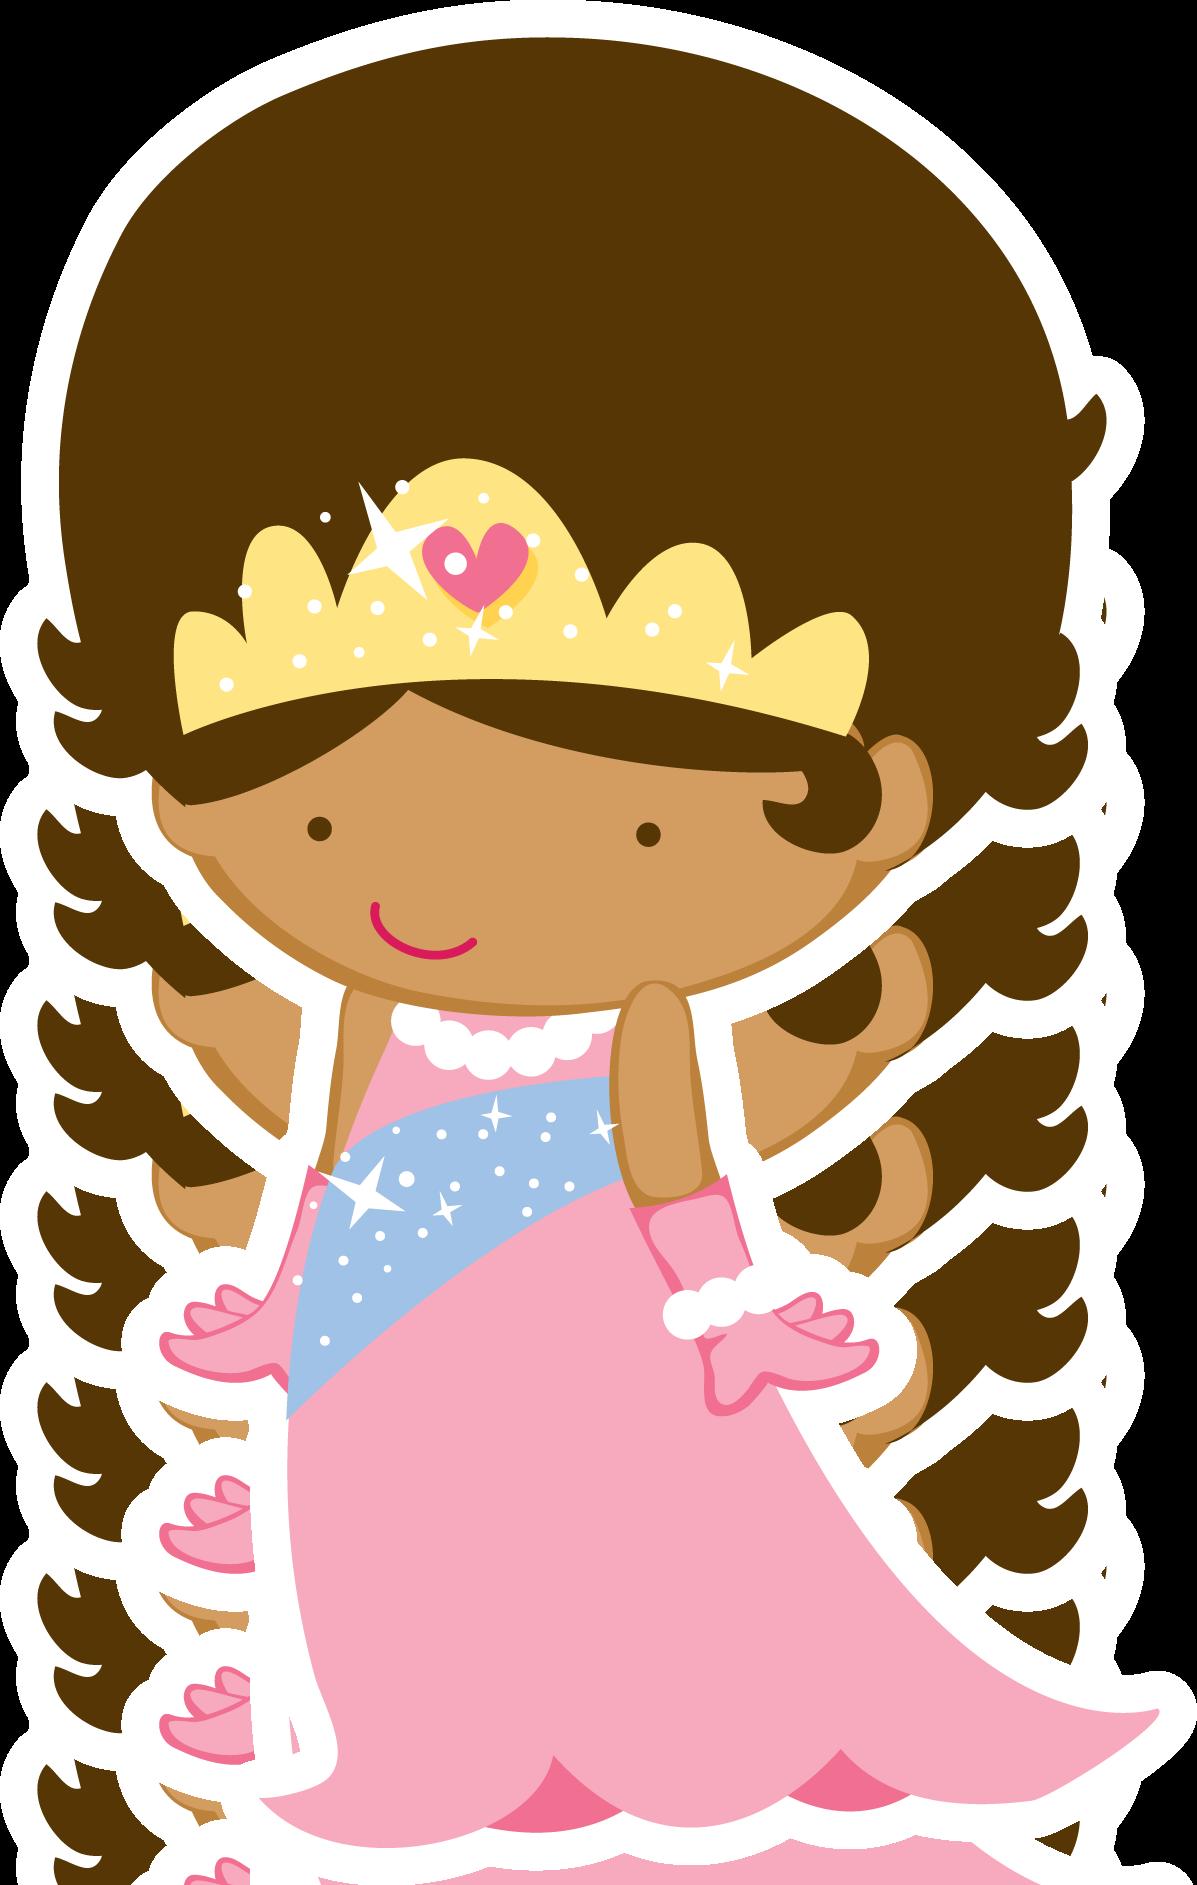 Chibi thanksgiving clipart svg library download ZWD FAIRITALE PRINCESS - ZWD_princess01.png - Minus | clipart ... svg library download